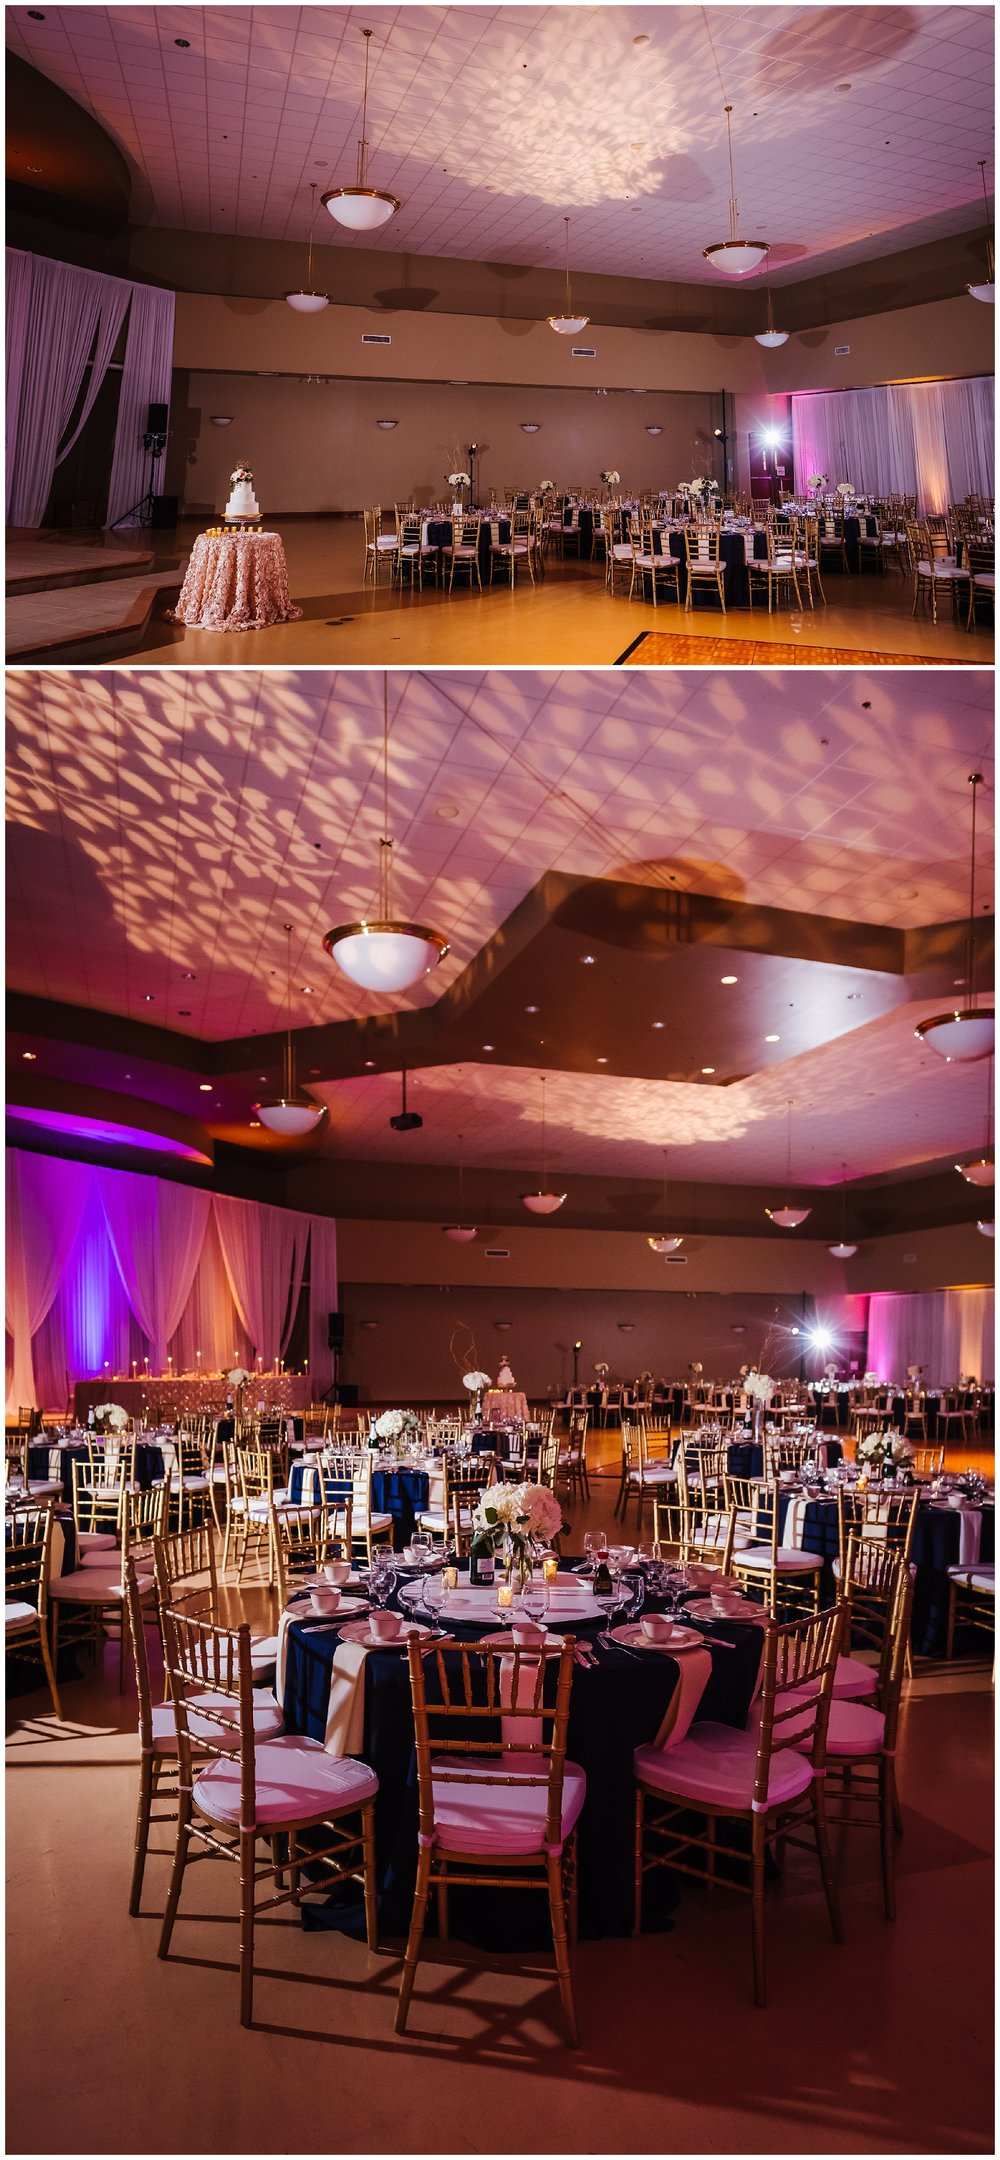 tampa-wedding-photographer-philipino-colorful-woods-ballroom-church-mass-confetti-fuscia_0060.jpg